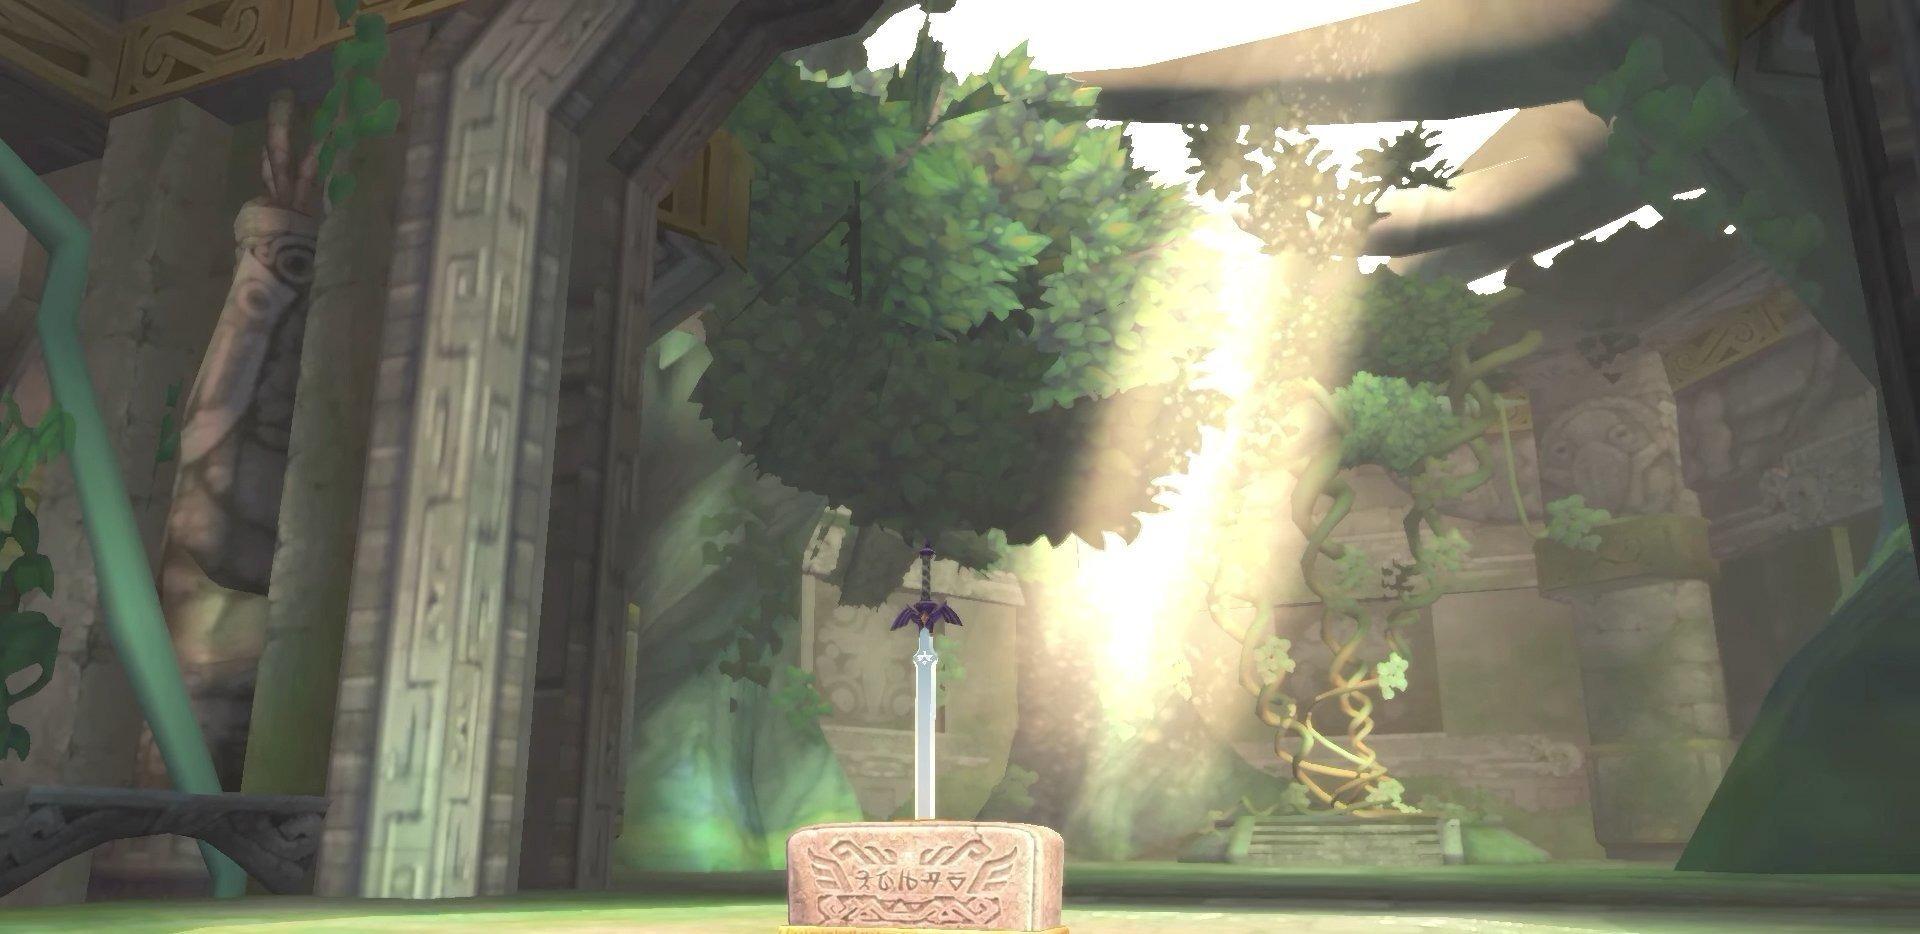 Soar through memories in latest The Legend of Zelda: Skyward Sword HD screenshots